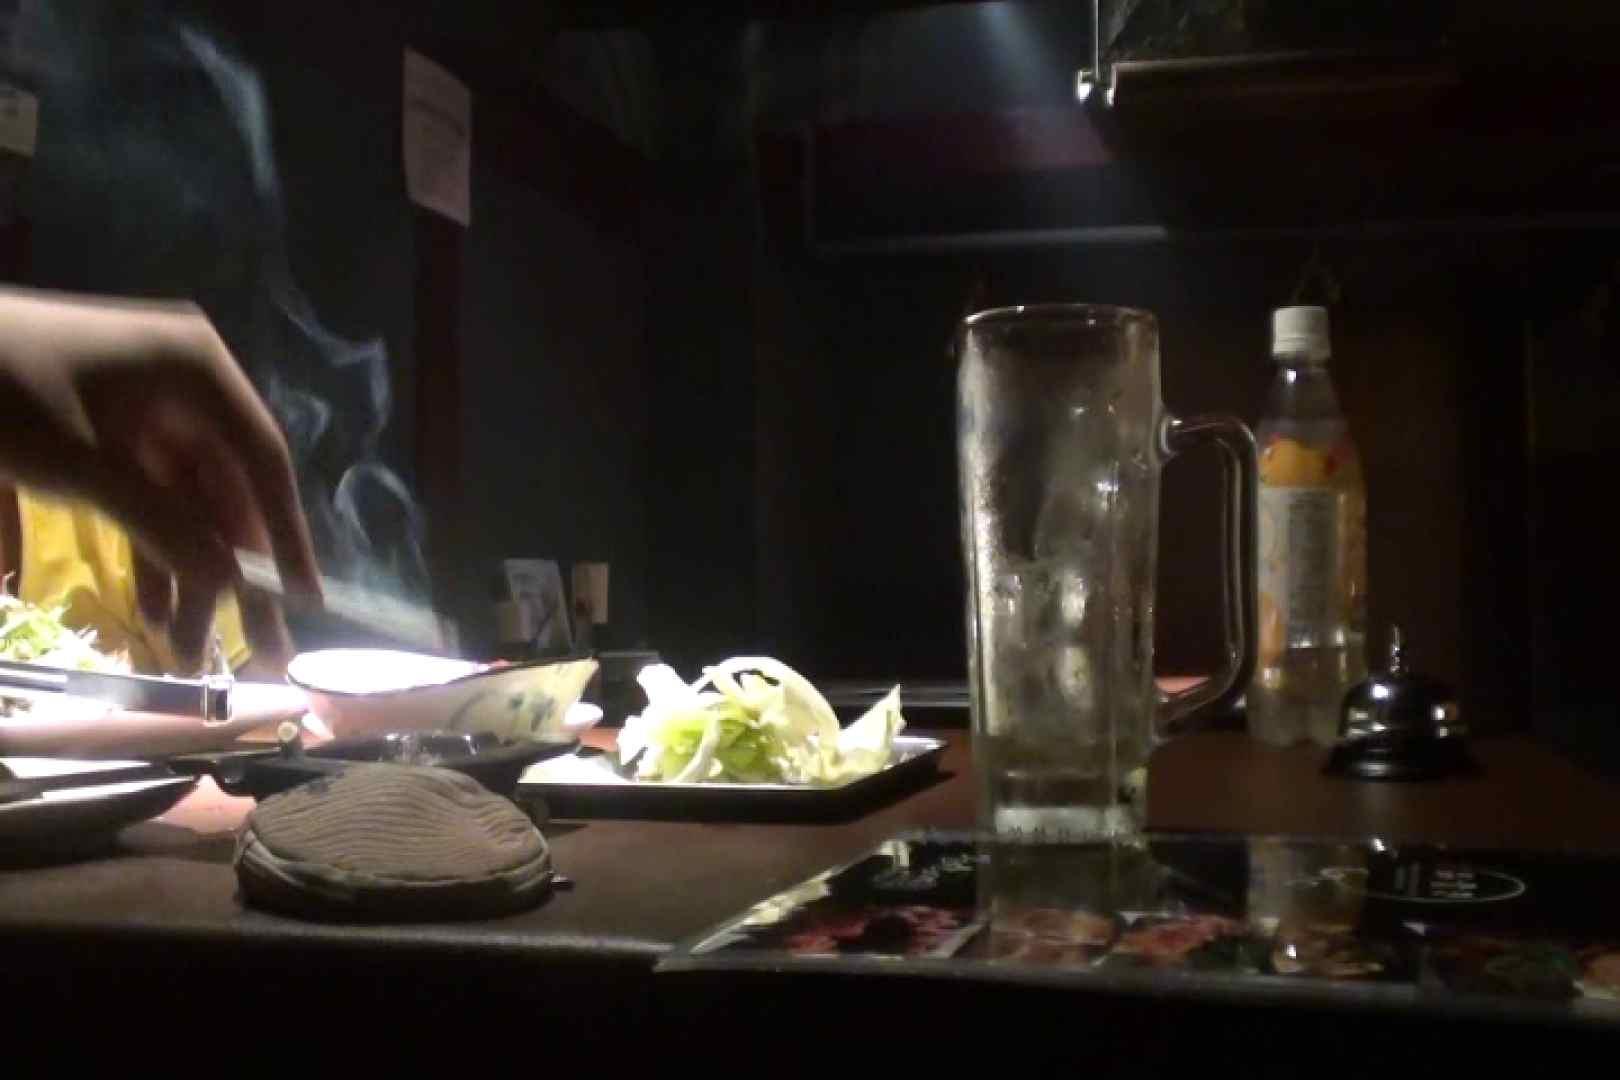 福岡援交 前編 無修正マンコ 戯れ無修正画像 58連発 13